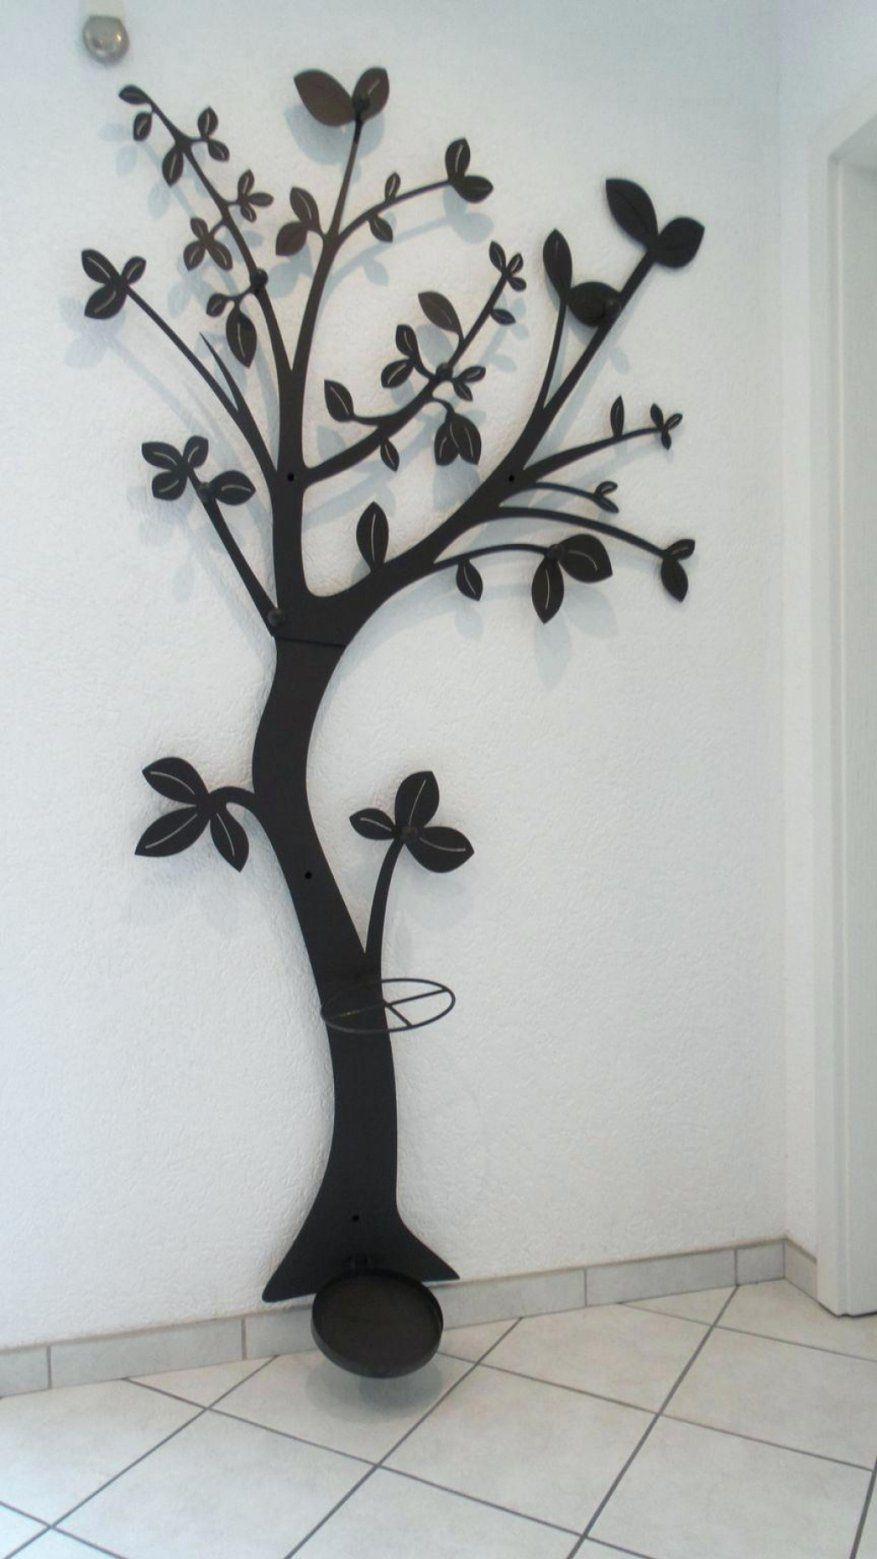 Ehrfurcht Gebietend Garderobe Baum Selber Bauen Garderobe Baum Uphw von Garderobe Baum Selber Bauen Bild